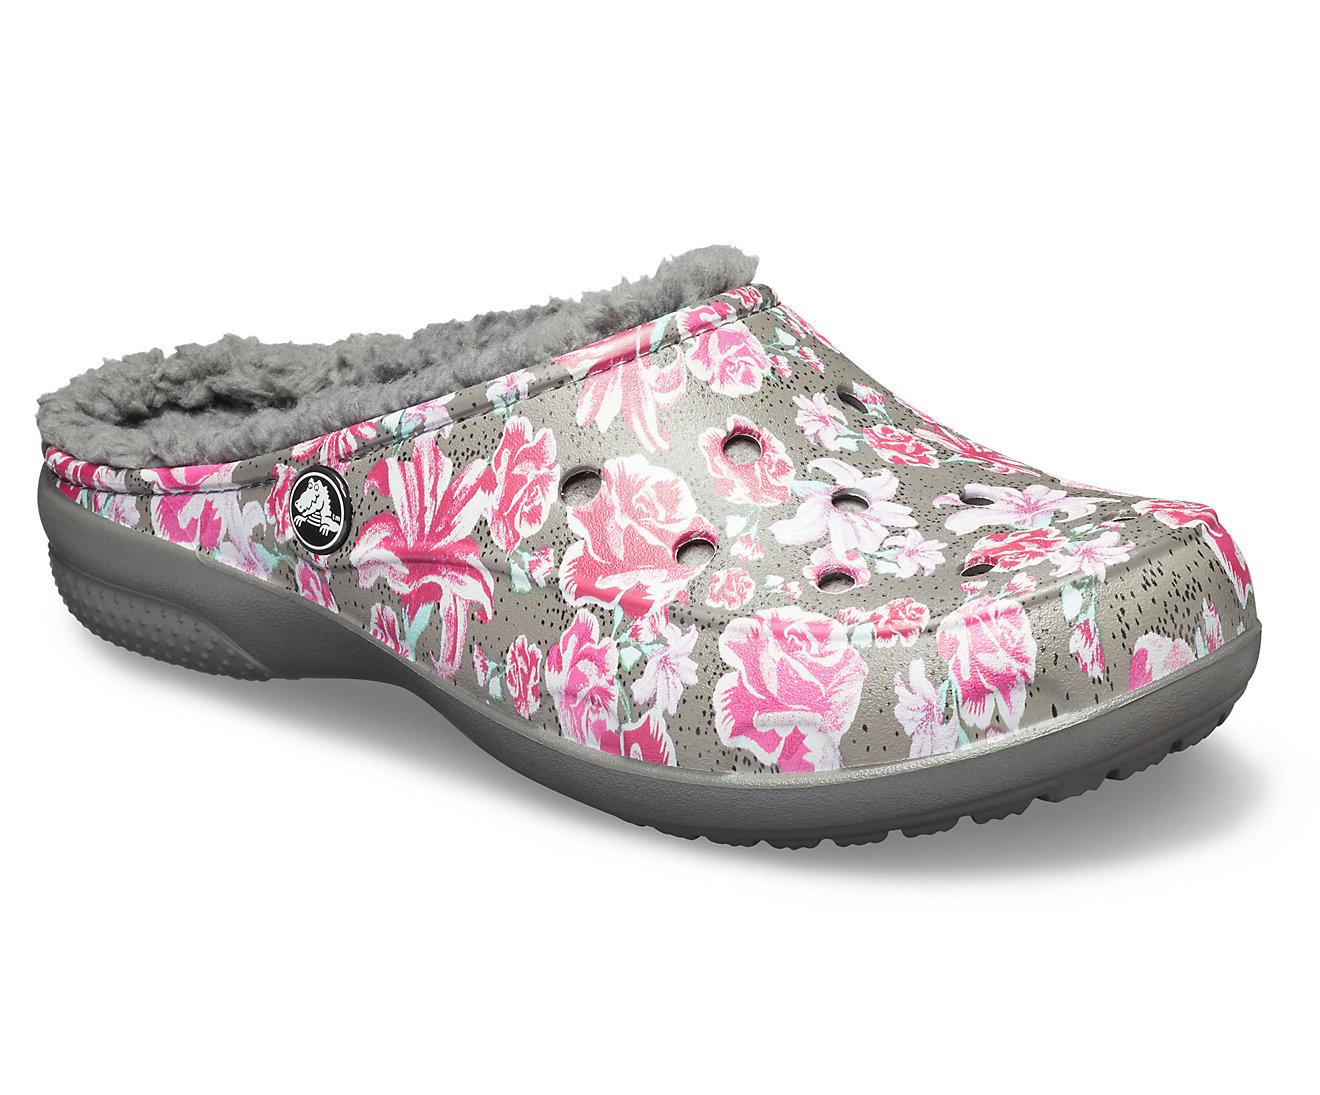 8d755cb55d Crocs farebné zateplené šľapky Freesail Graphic Lined Multi Floral ...